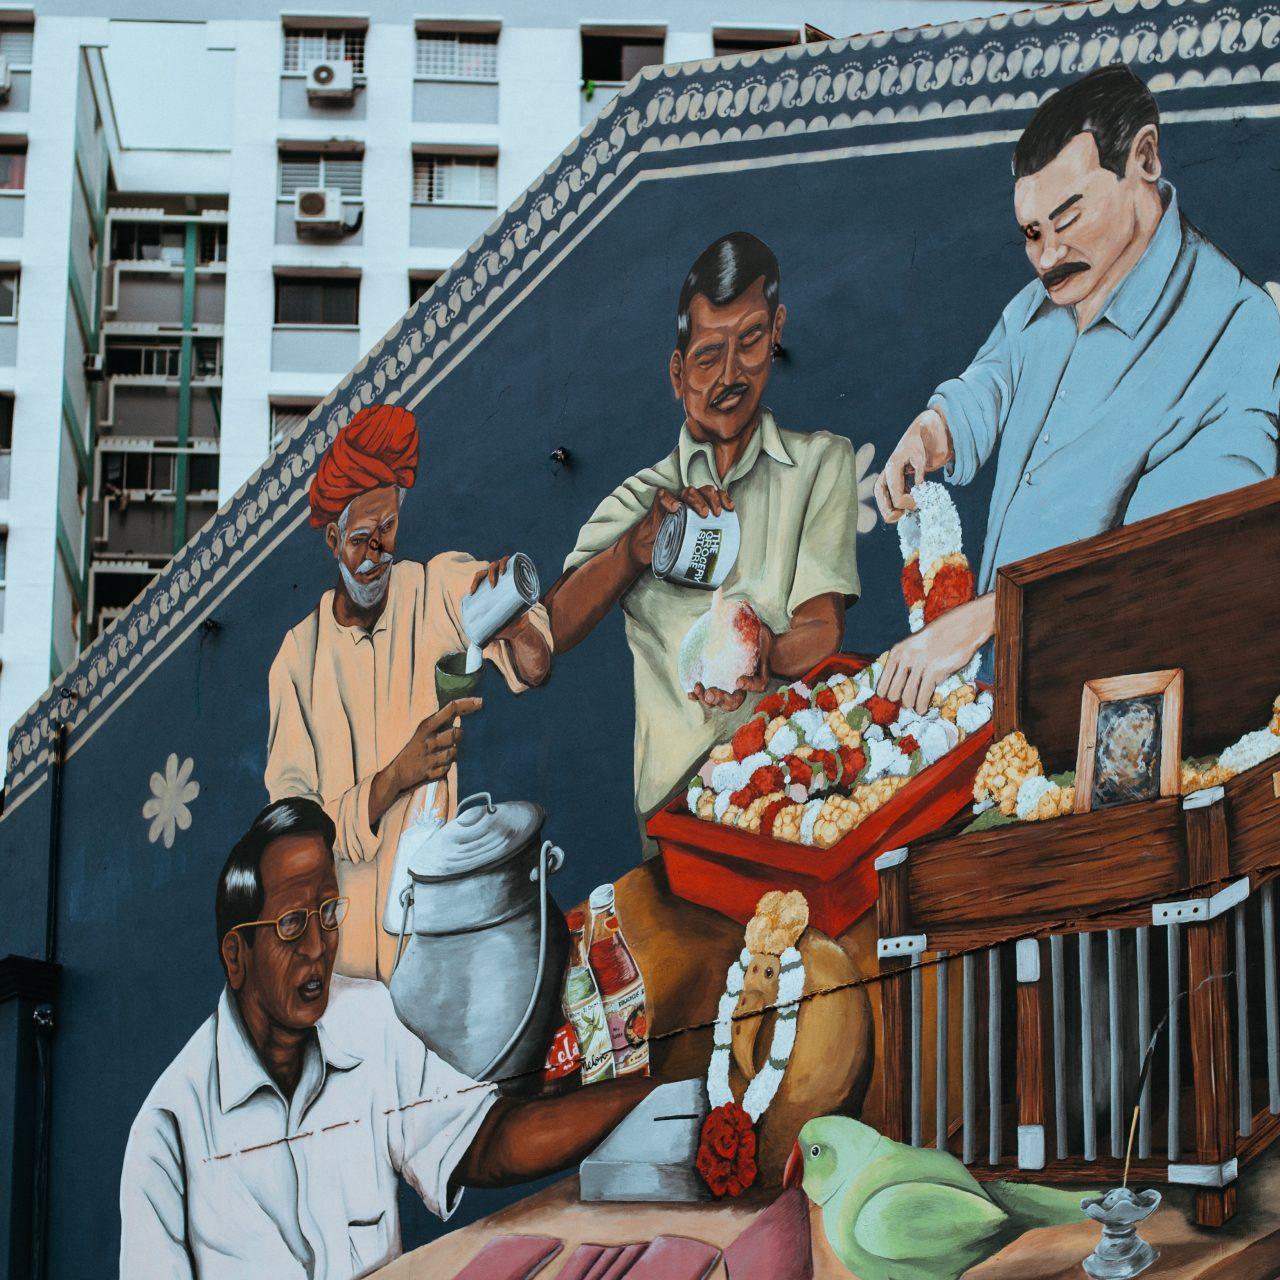 Rice-Media-UNESCO-HERITAGE-HAWKER-SINGAPOREAN-CULTURE-1